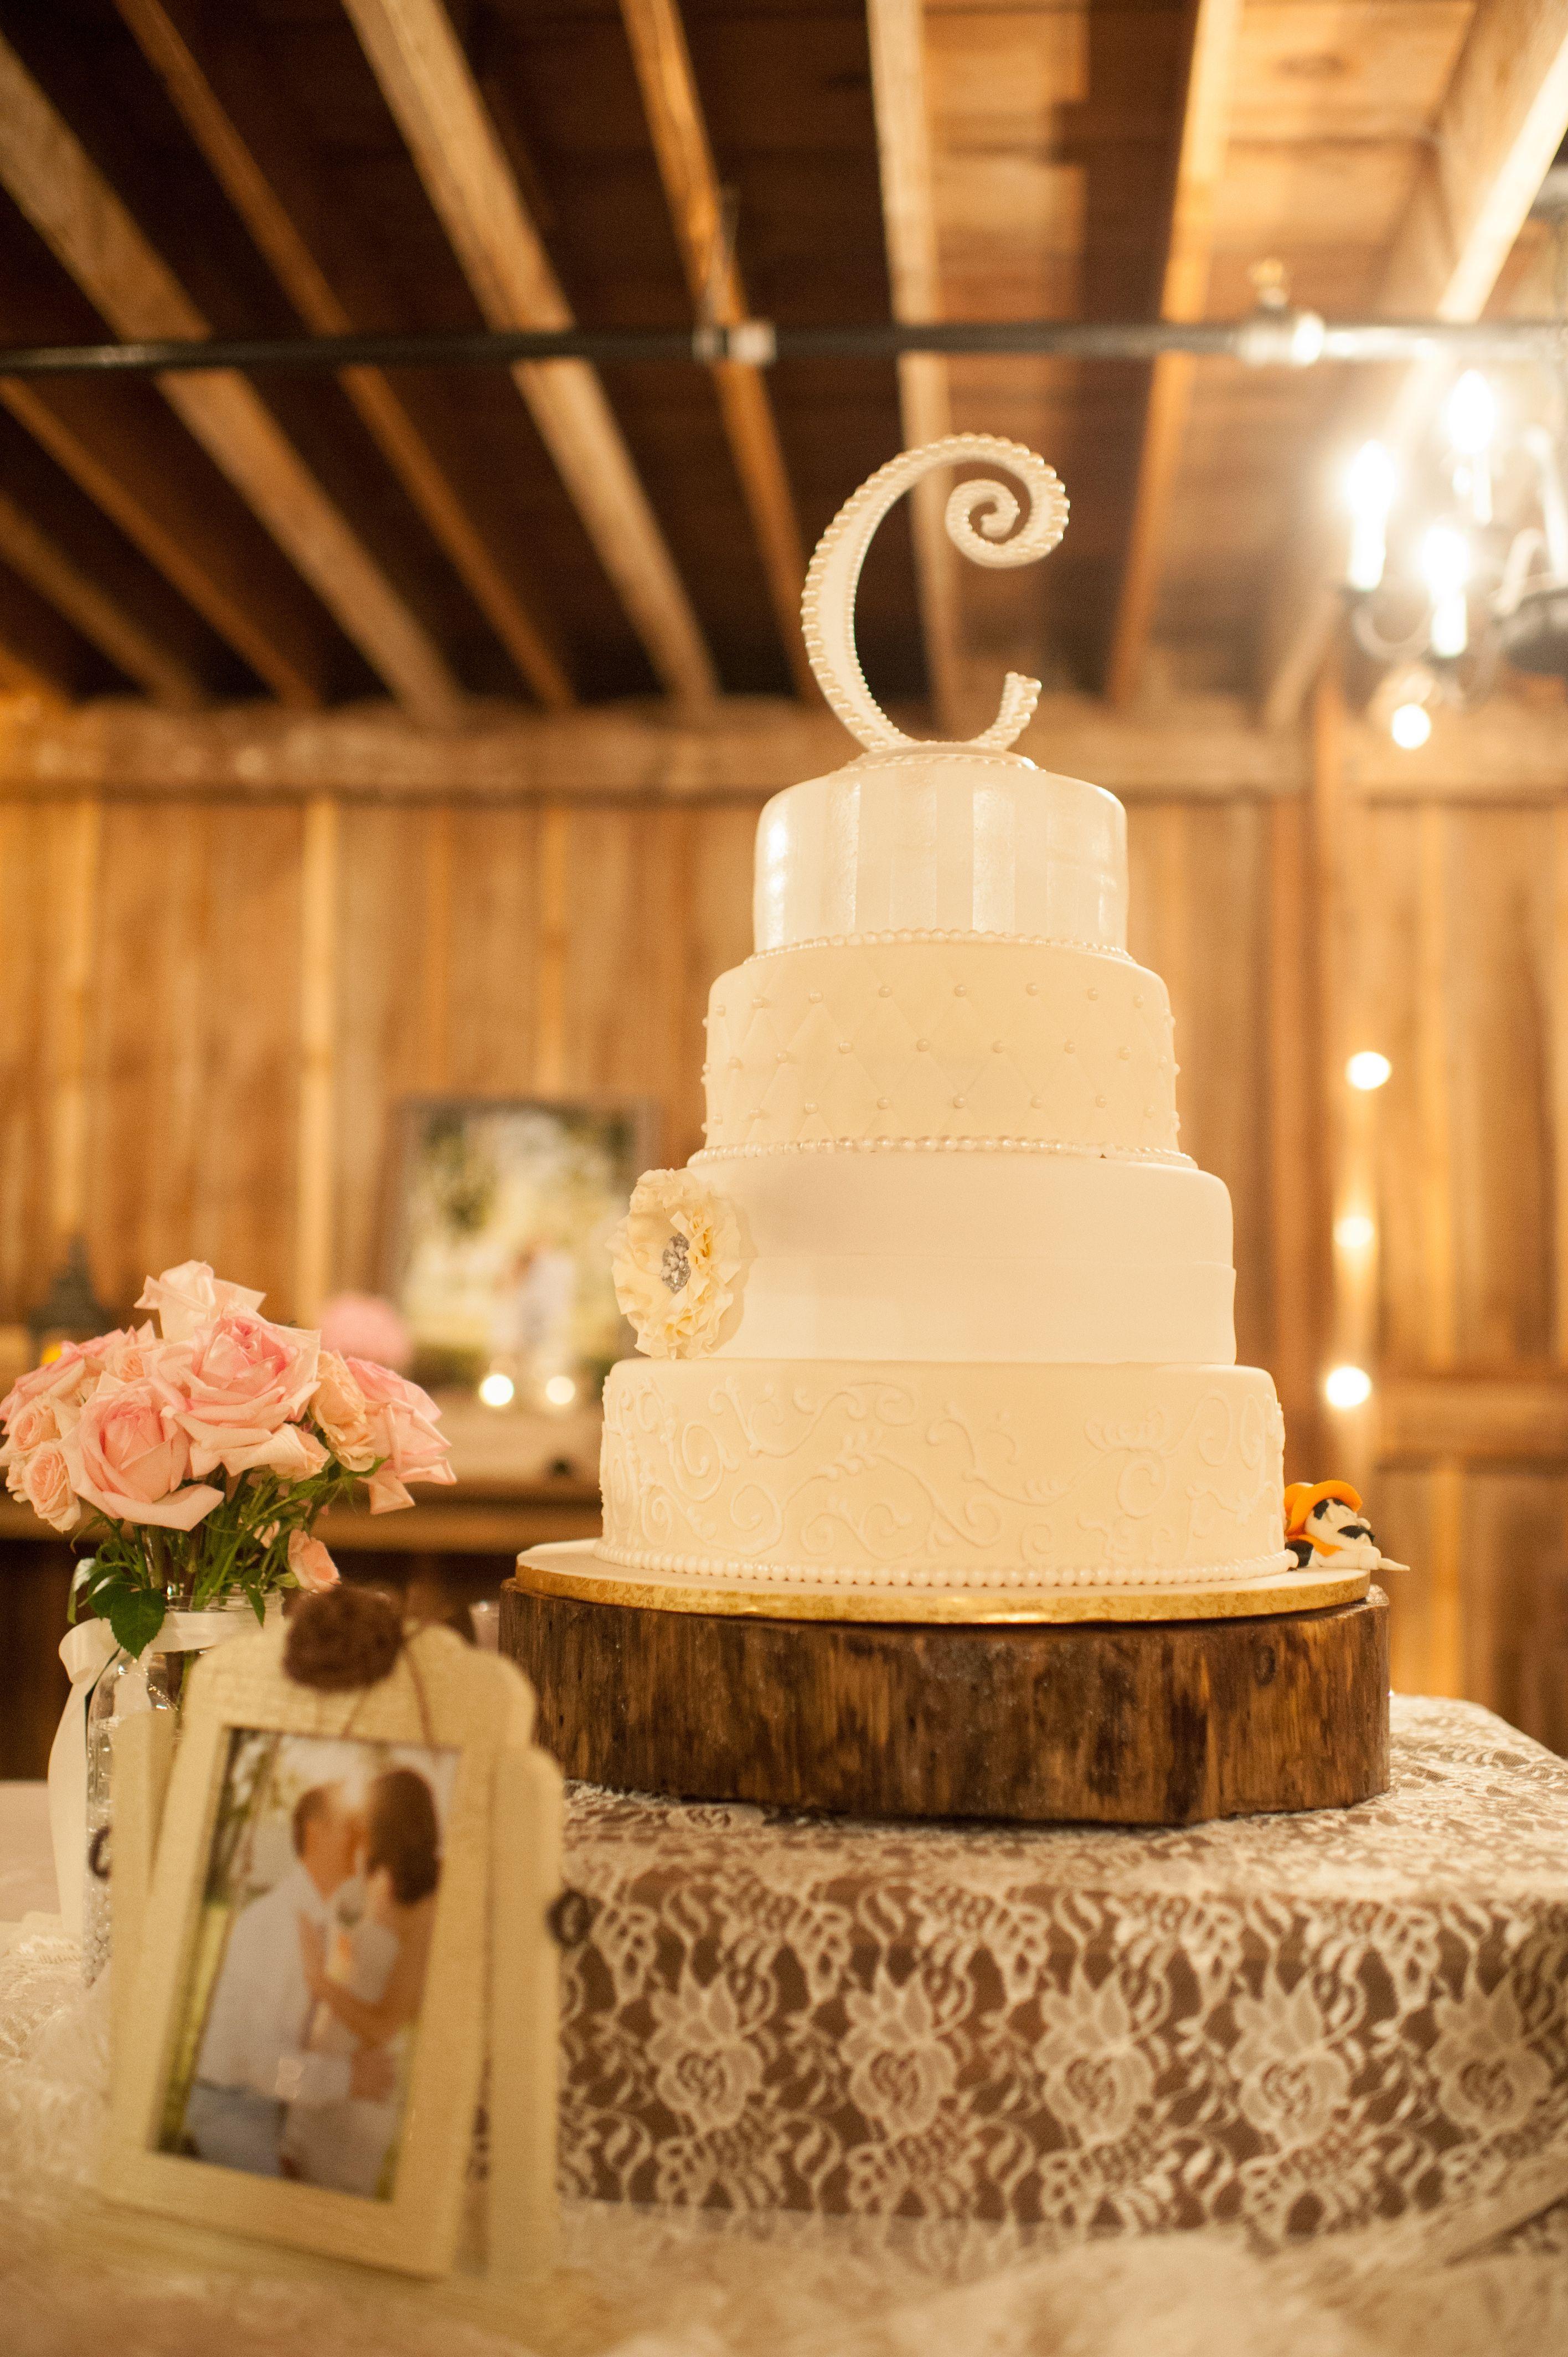 Cobb Country Wedding cake!! | Cobb Country Wedding | Pinterest ...